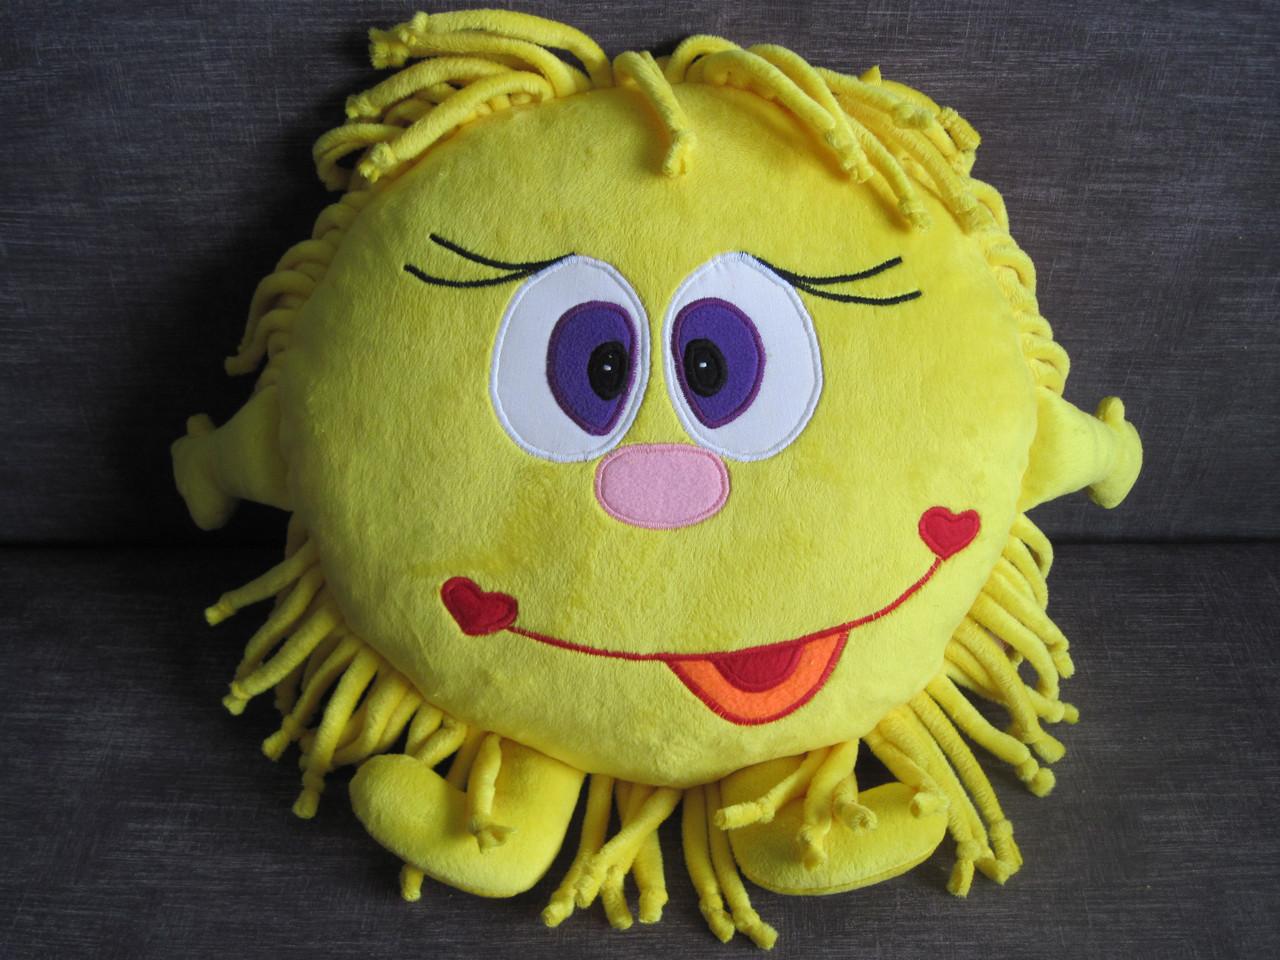 Мягкая игрушка - подушка Солнце ручная работа